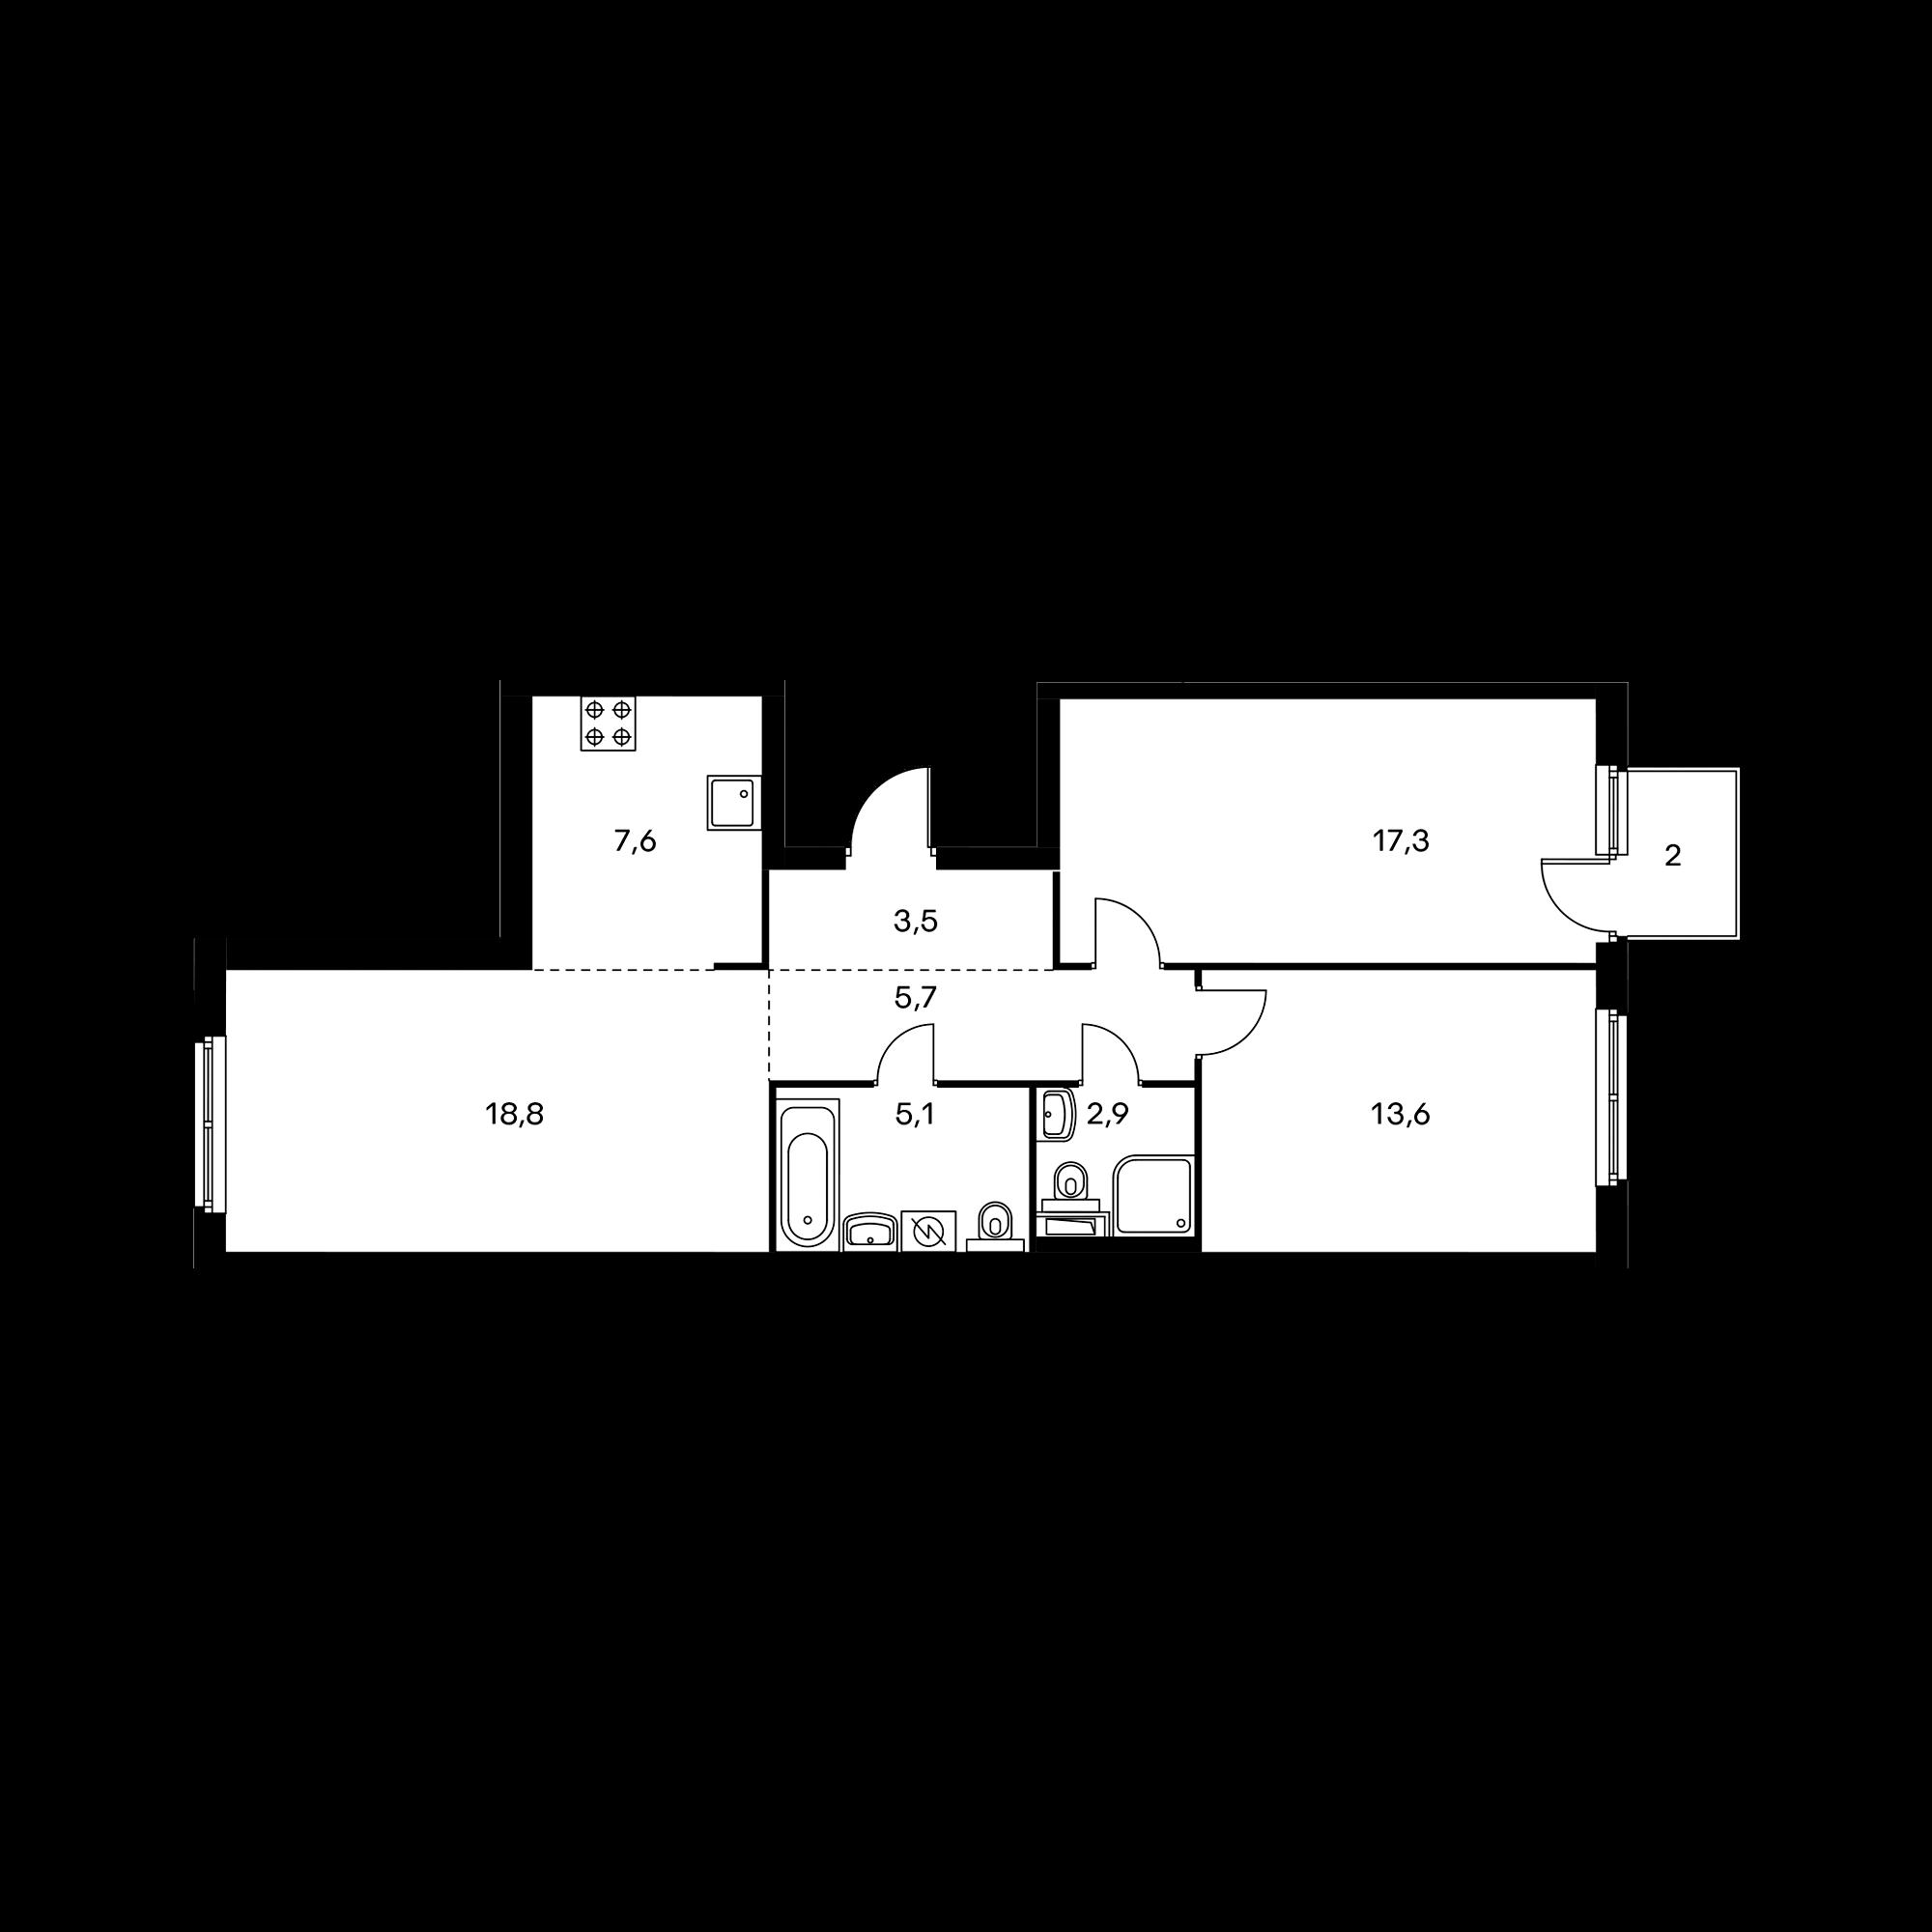 3NM0_6.3-1ZB1